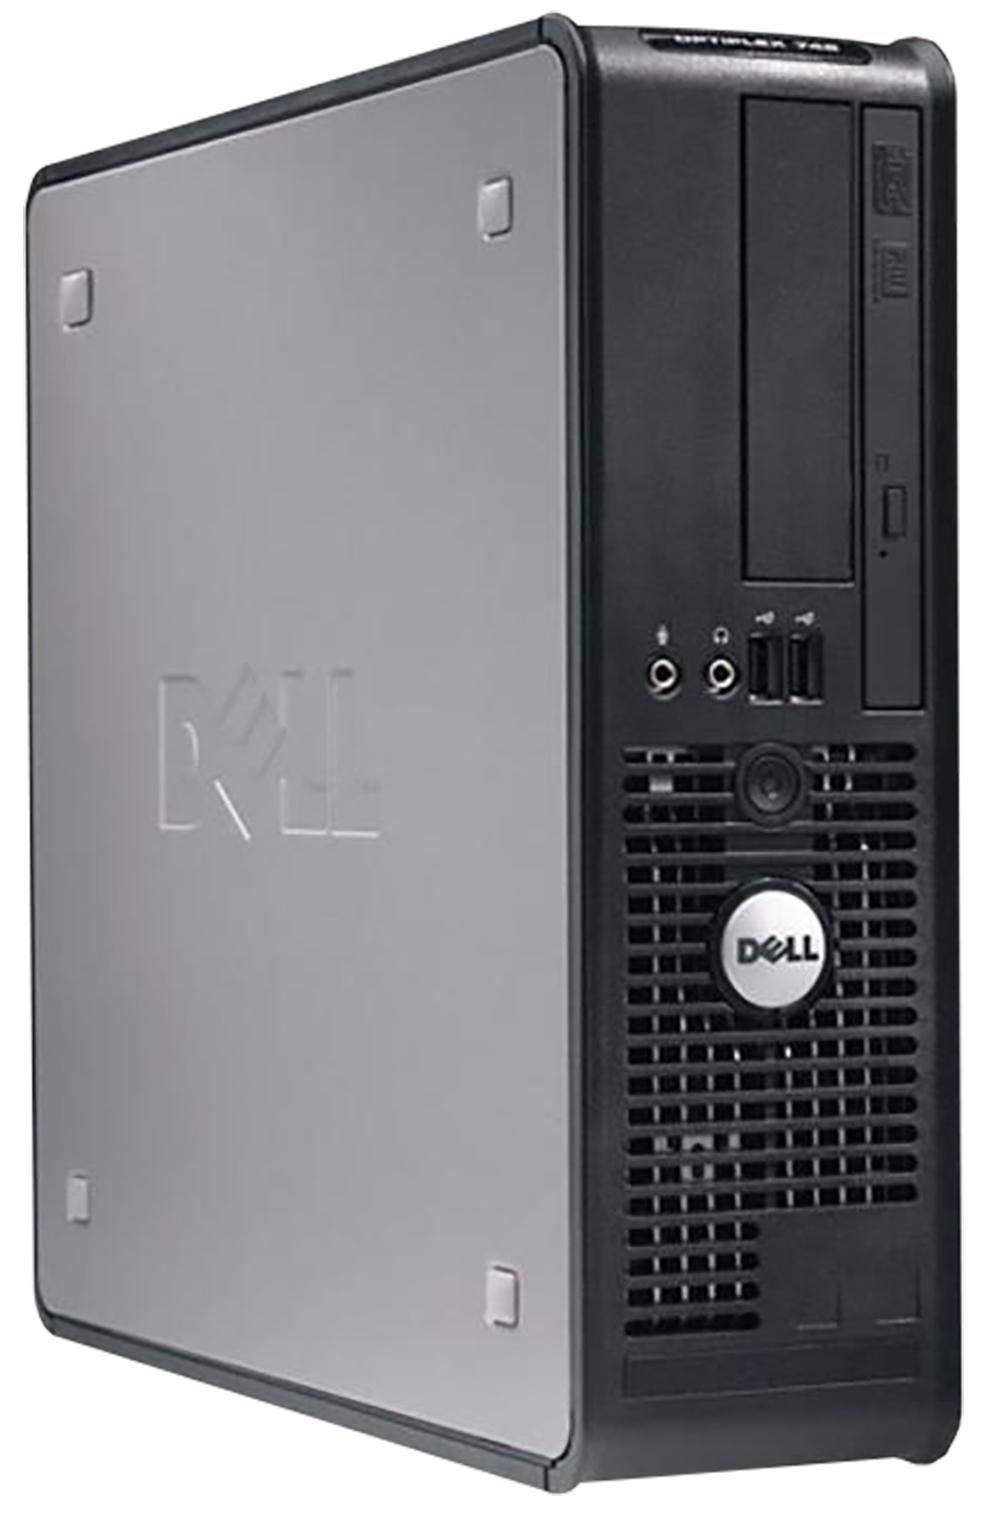 Dell Optiplex GX620 Specs   Dell Desktop Computers   Aventis Systems